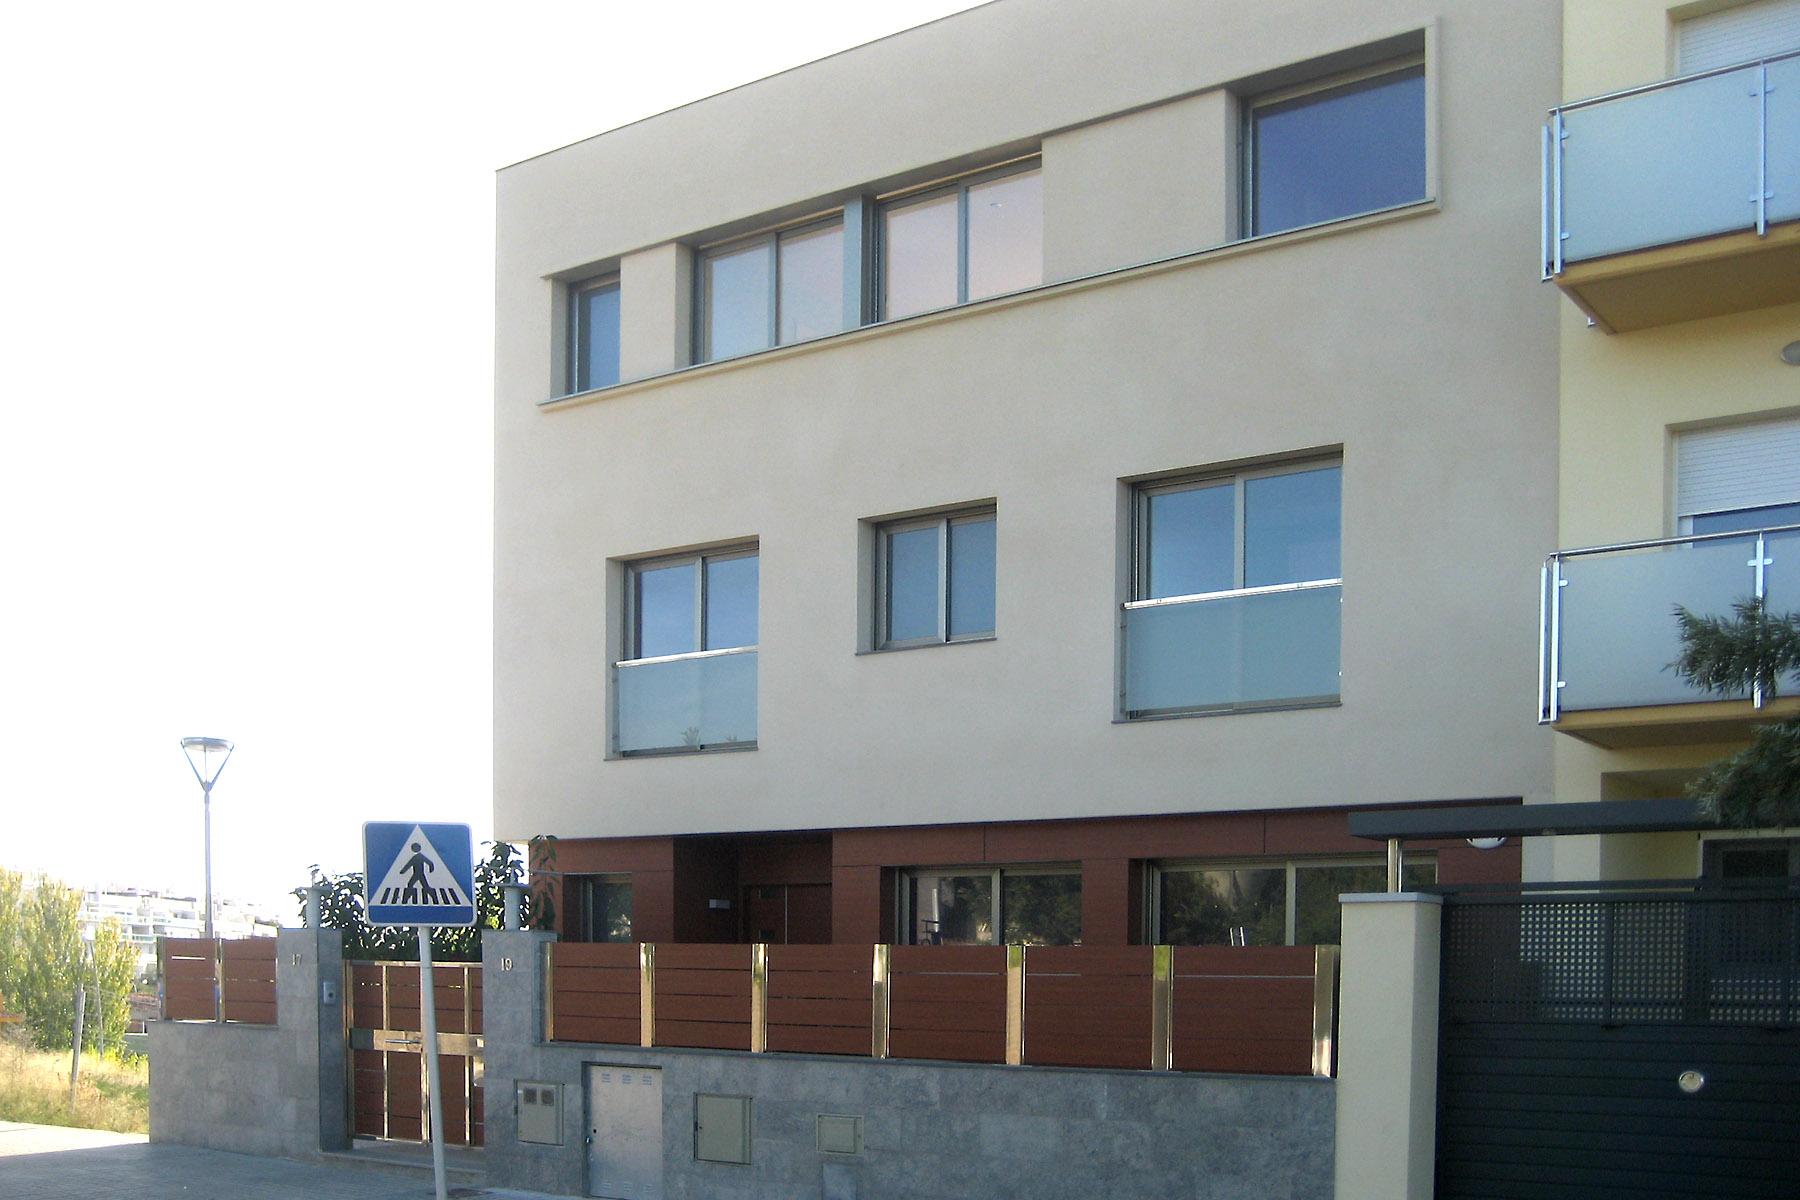 Contreras-Albareda-Single-Family-House-Cami-Antoniet-Sitges-Barcelona-04